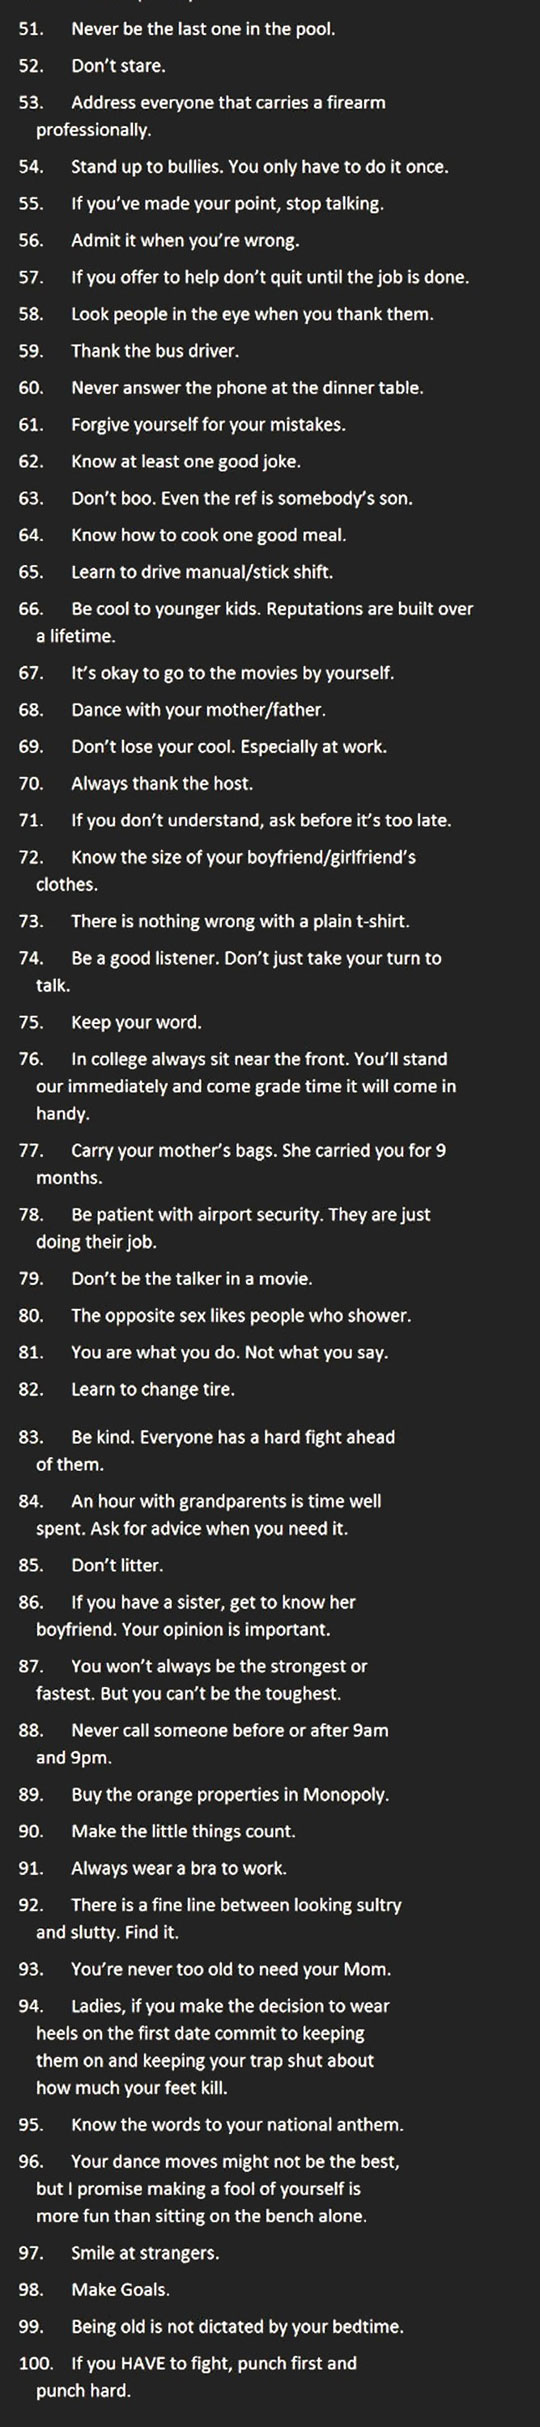 funny-teacher-highschool-wise-words-listener